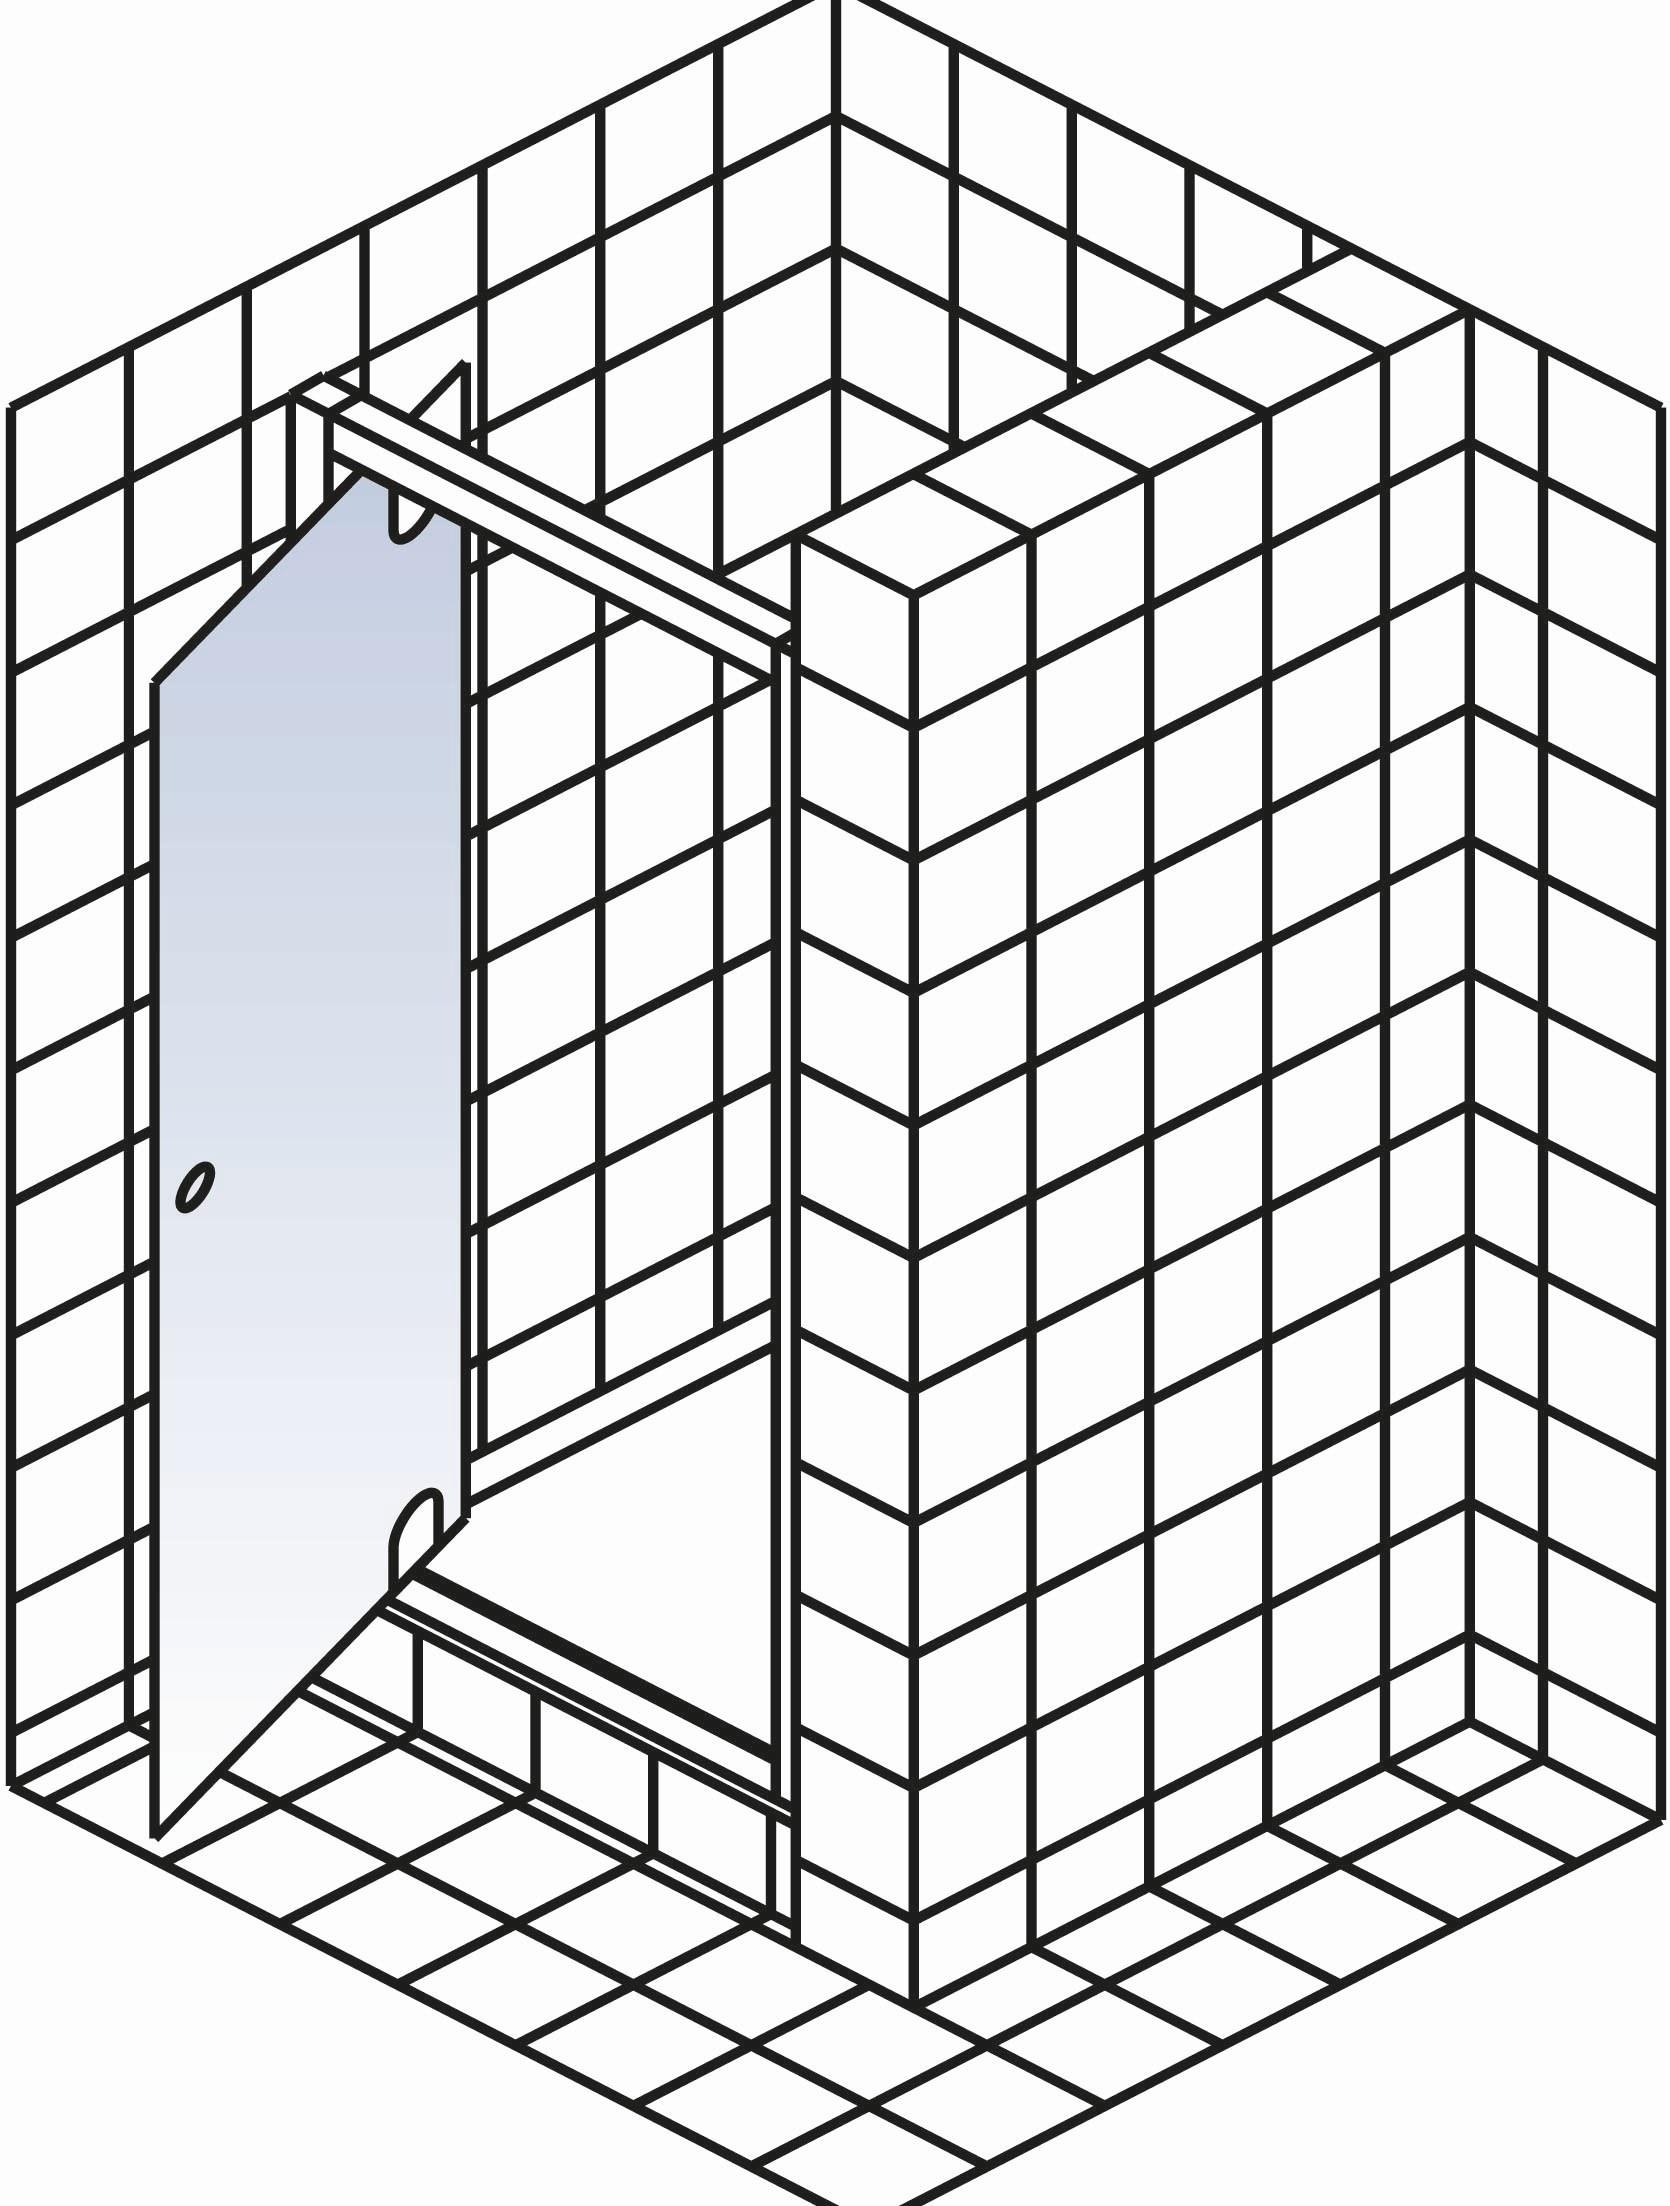 schulte kristall trend dreht r in nische sonderma d010099. Black Bedroom Furniture Sets. Home Design Ideas